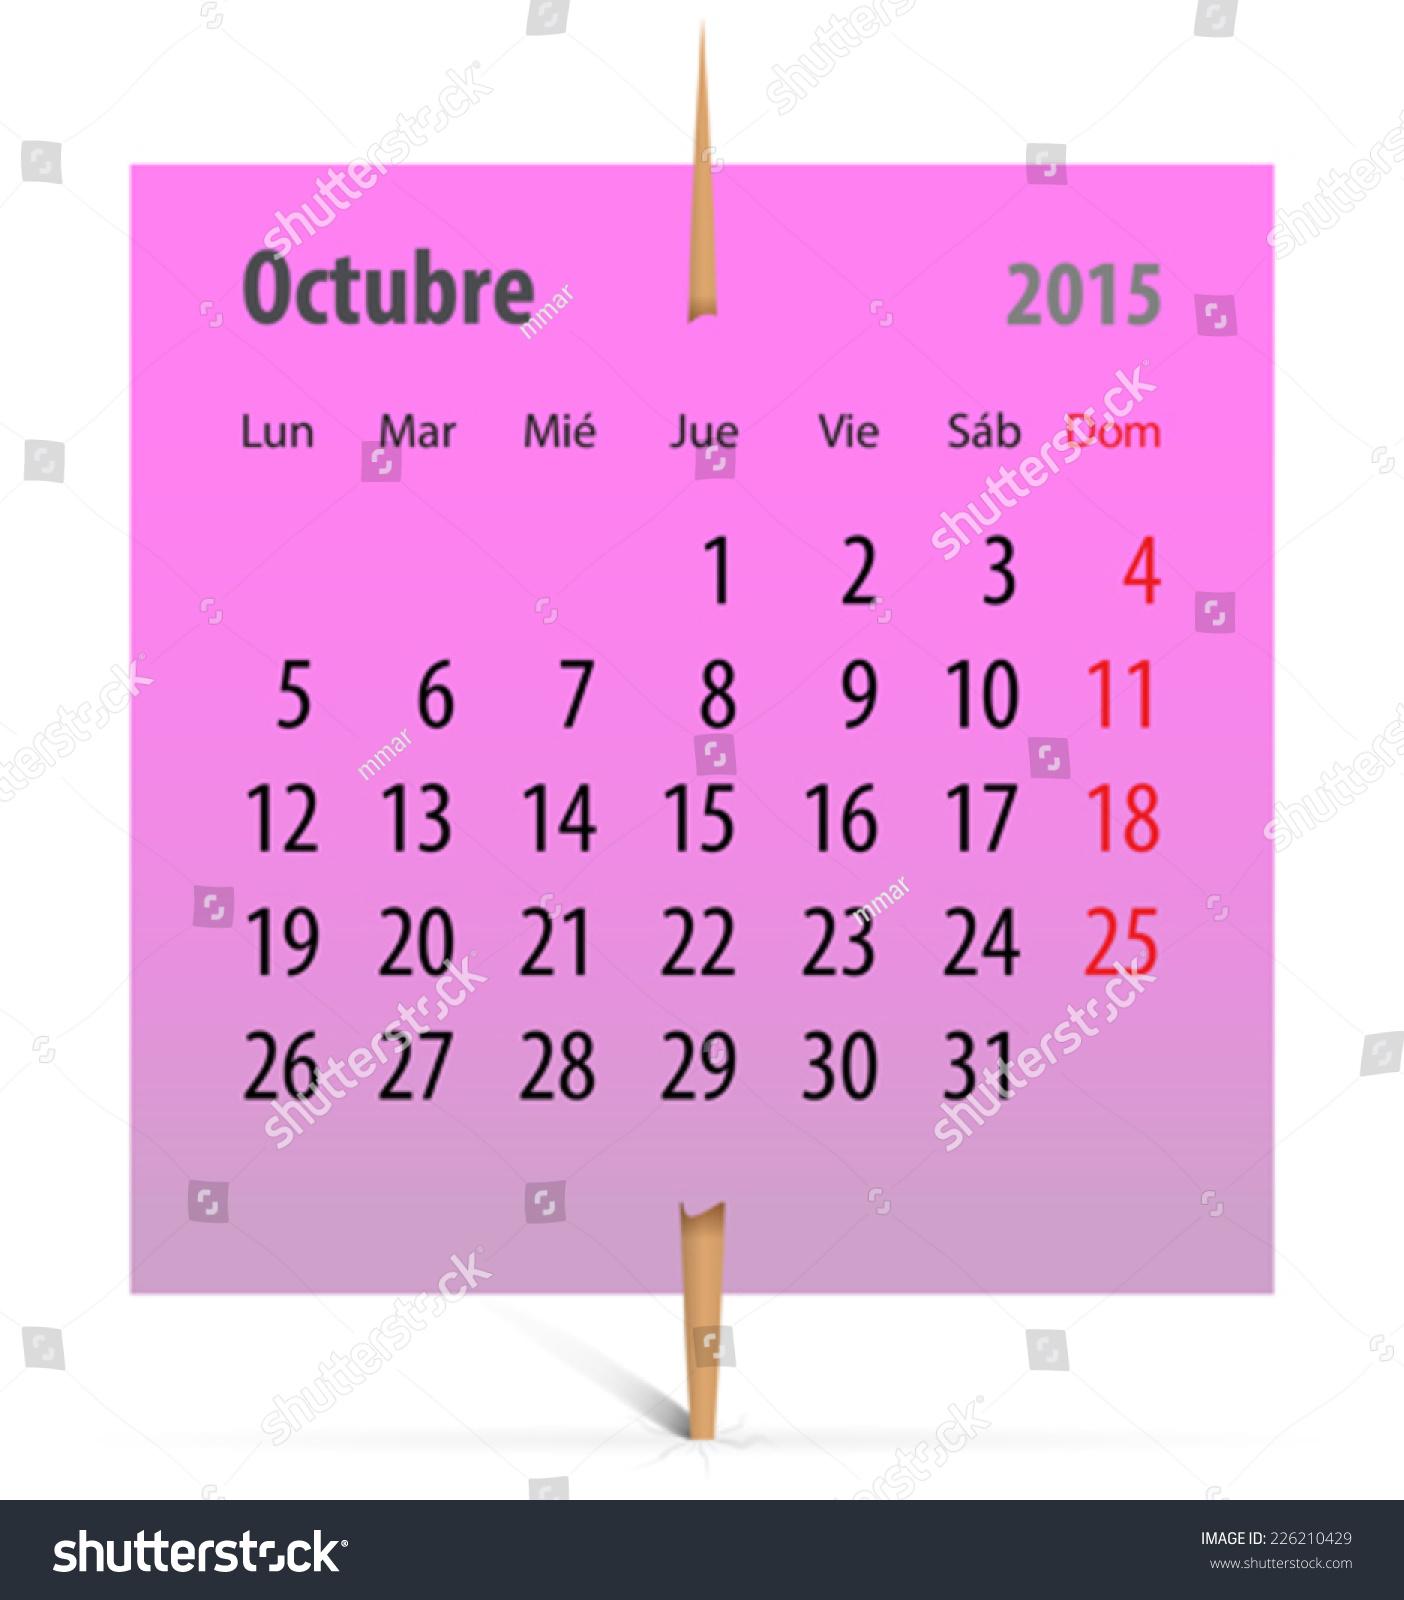 October Calendar 2015 Pink